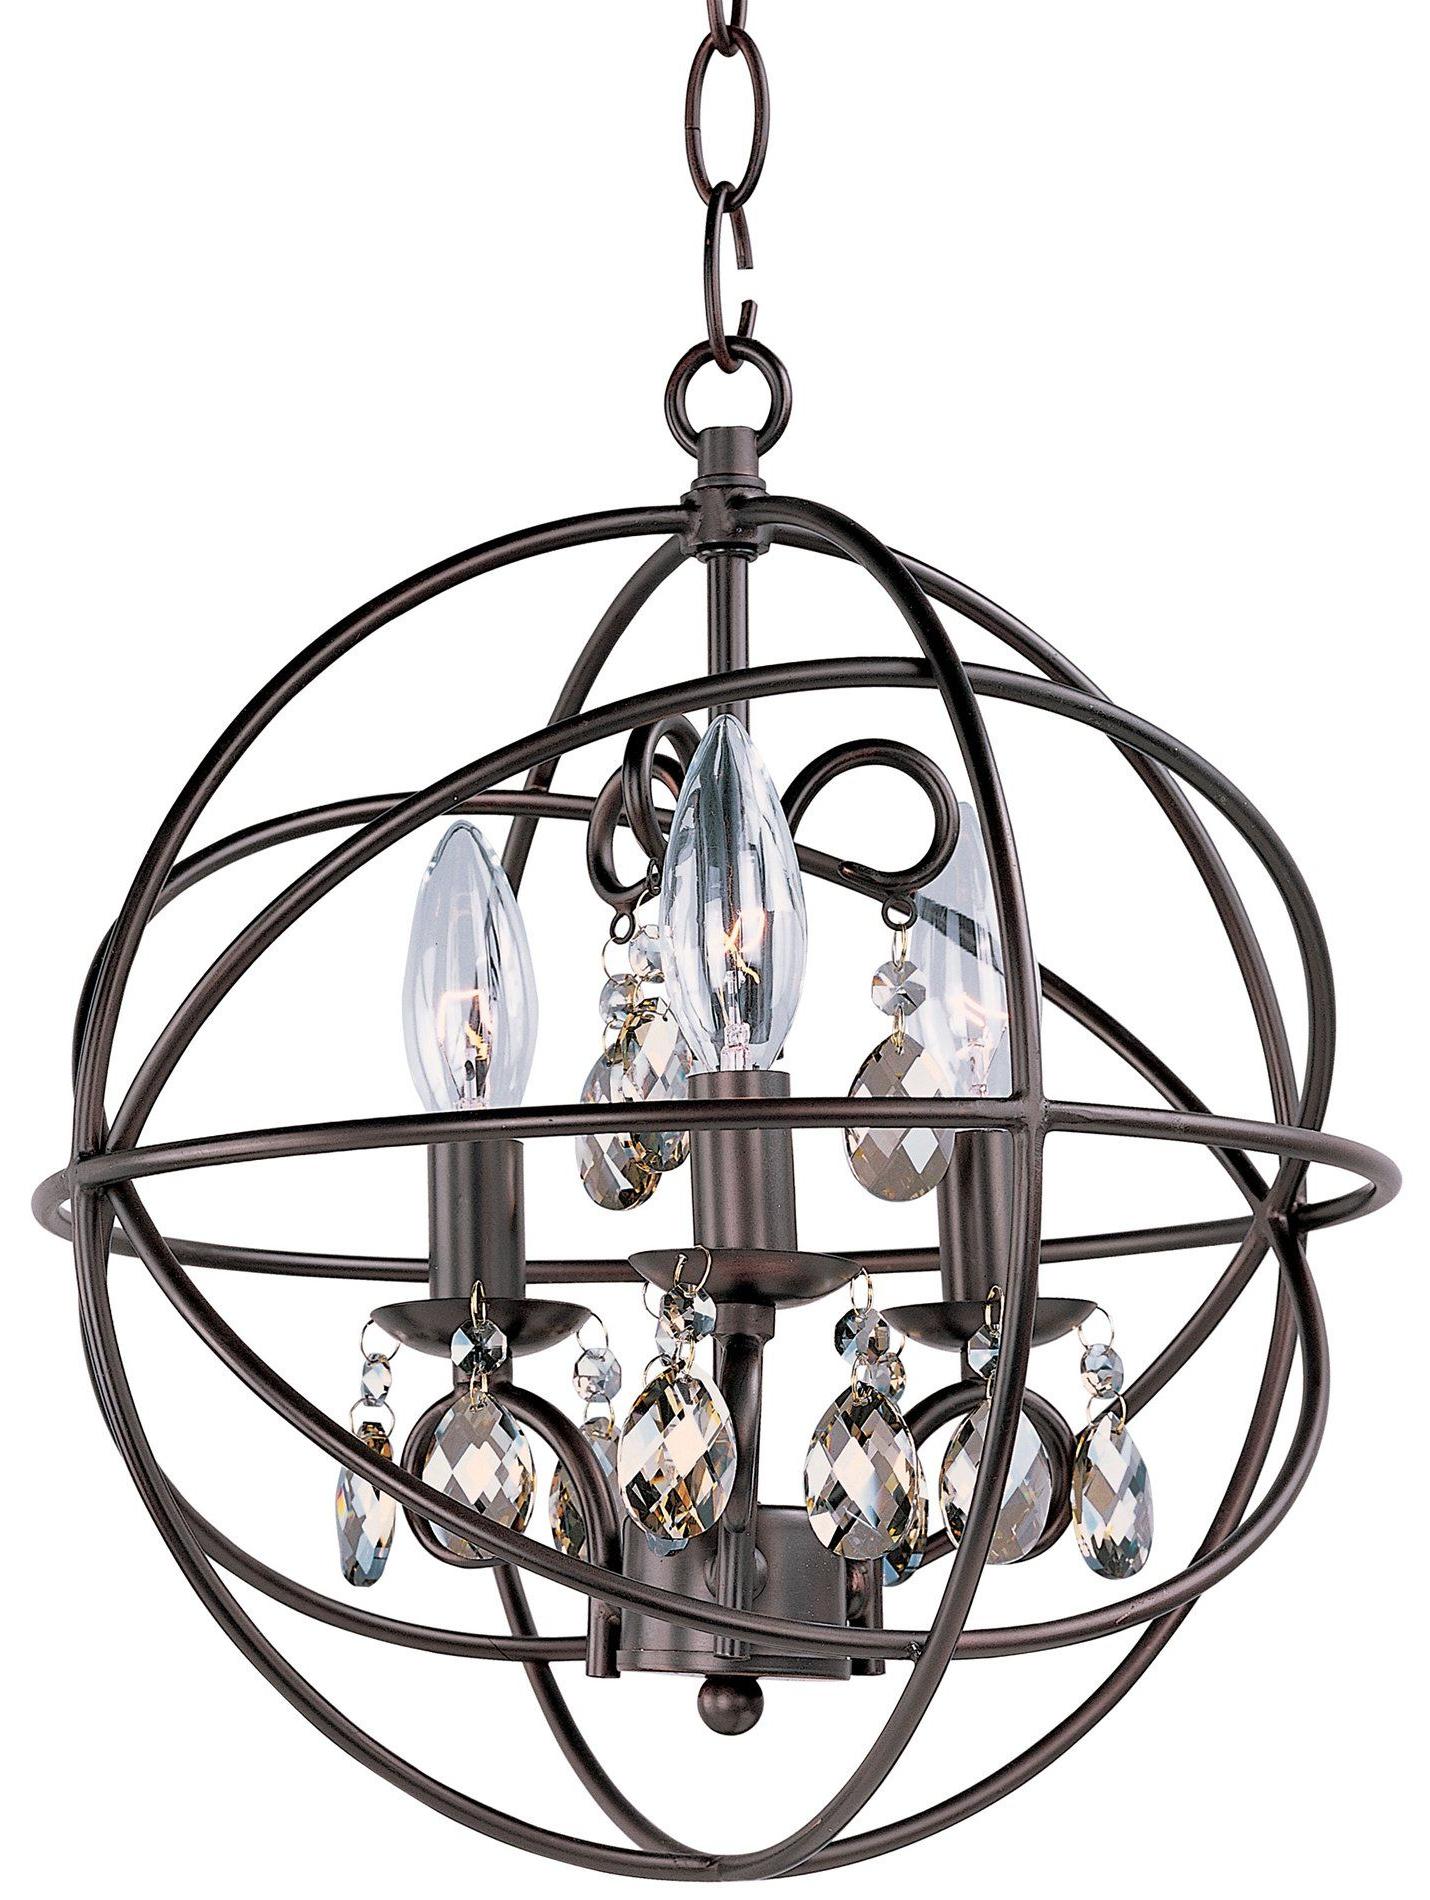 South Shore Decorating: Maxim Lighting 25140Oi Orbit Within Popular Alden 6 Light Globe Chandeliers (Gallery 9 of 20)